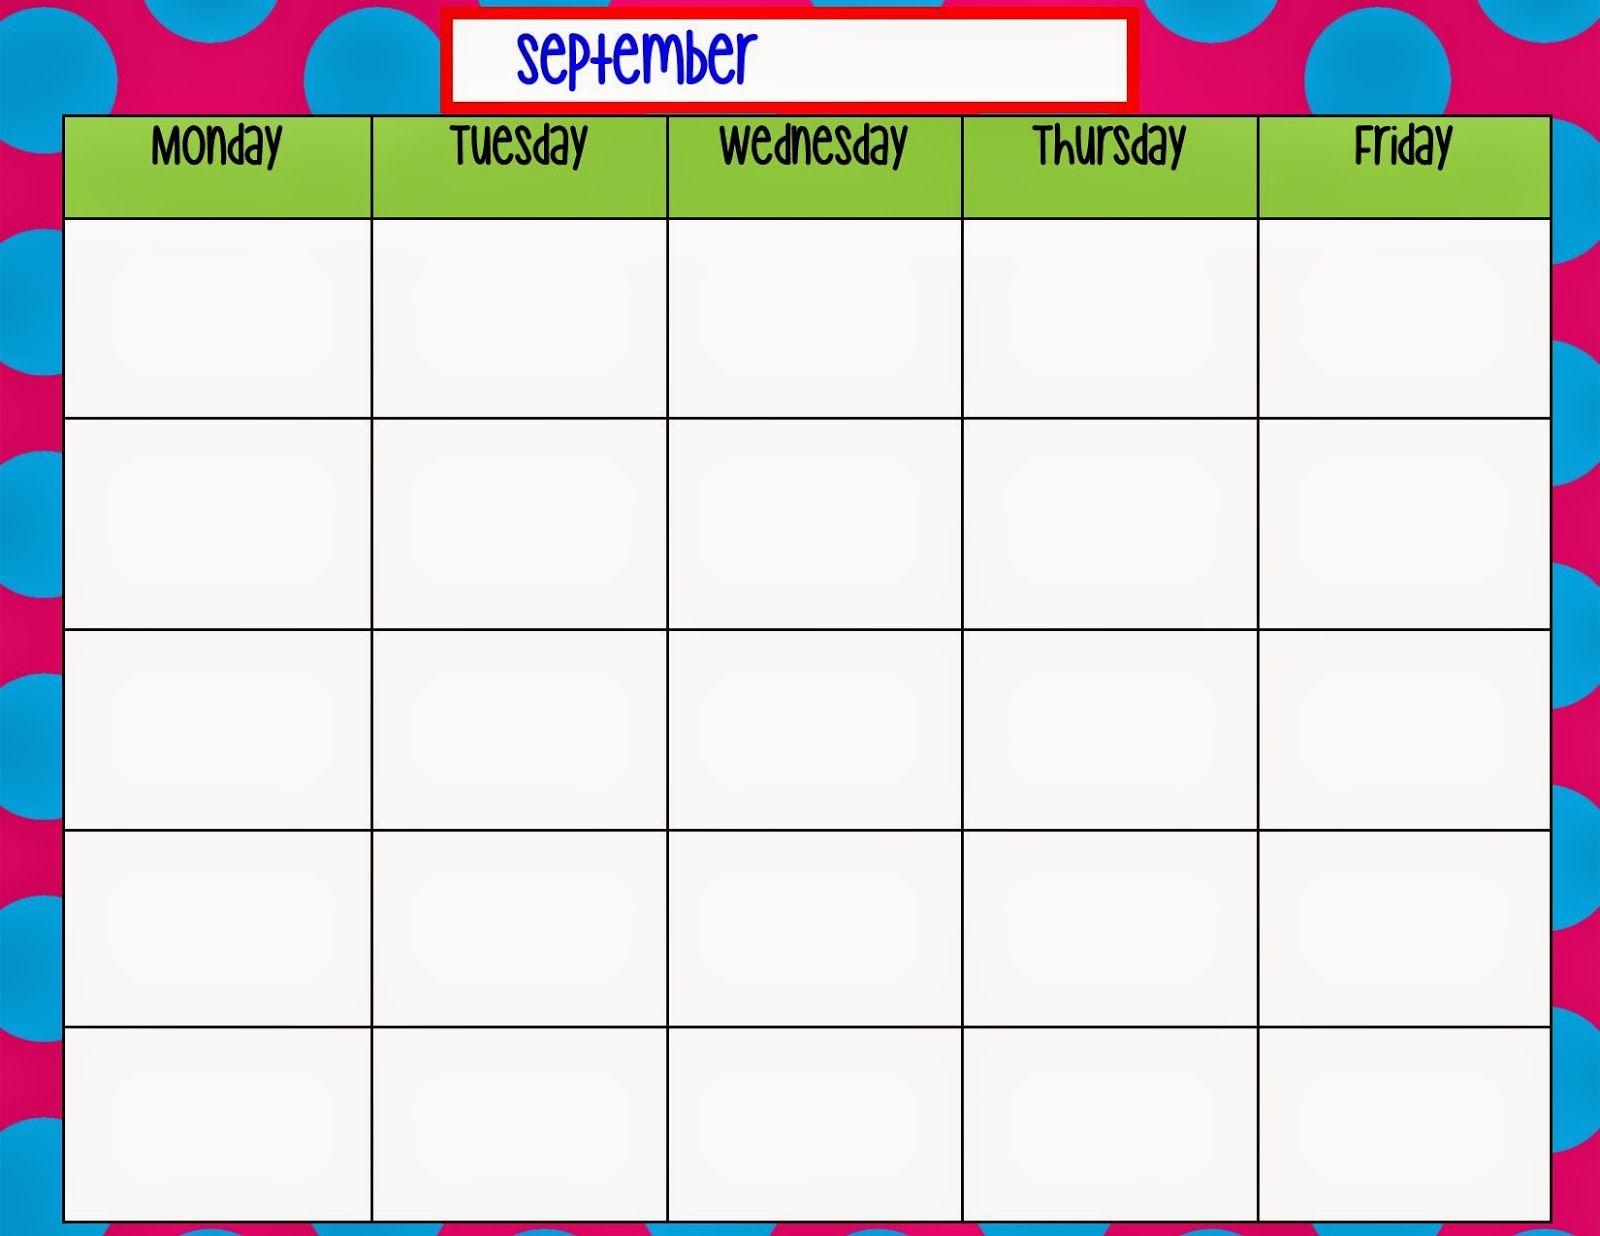 monday thru friday calendar